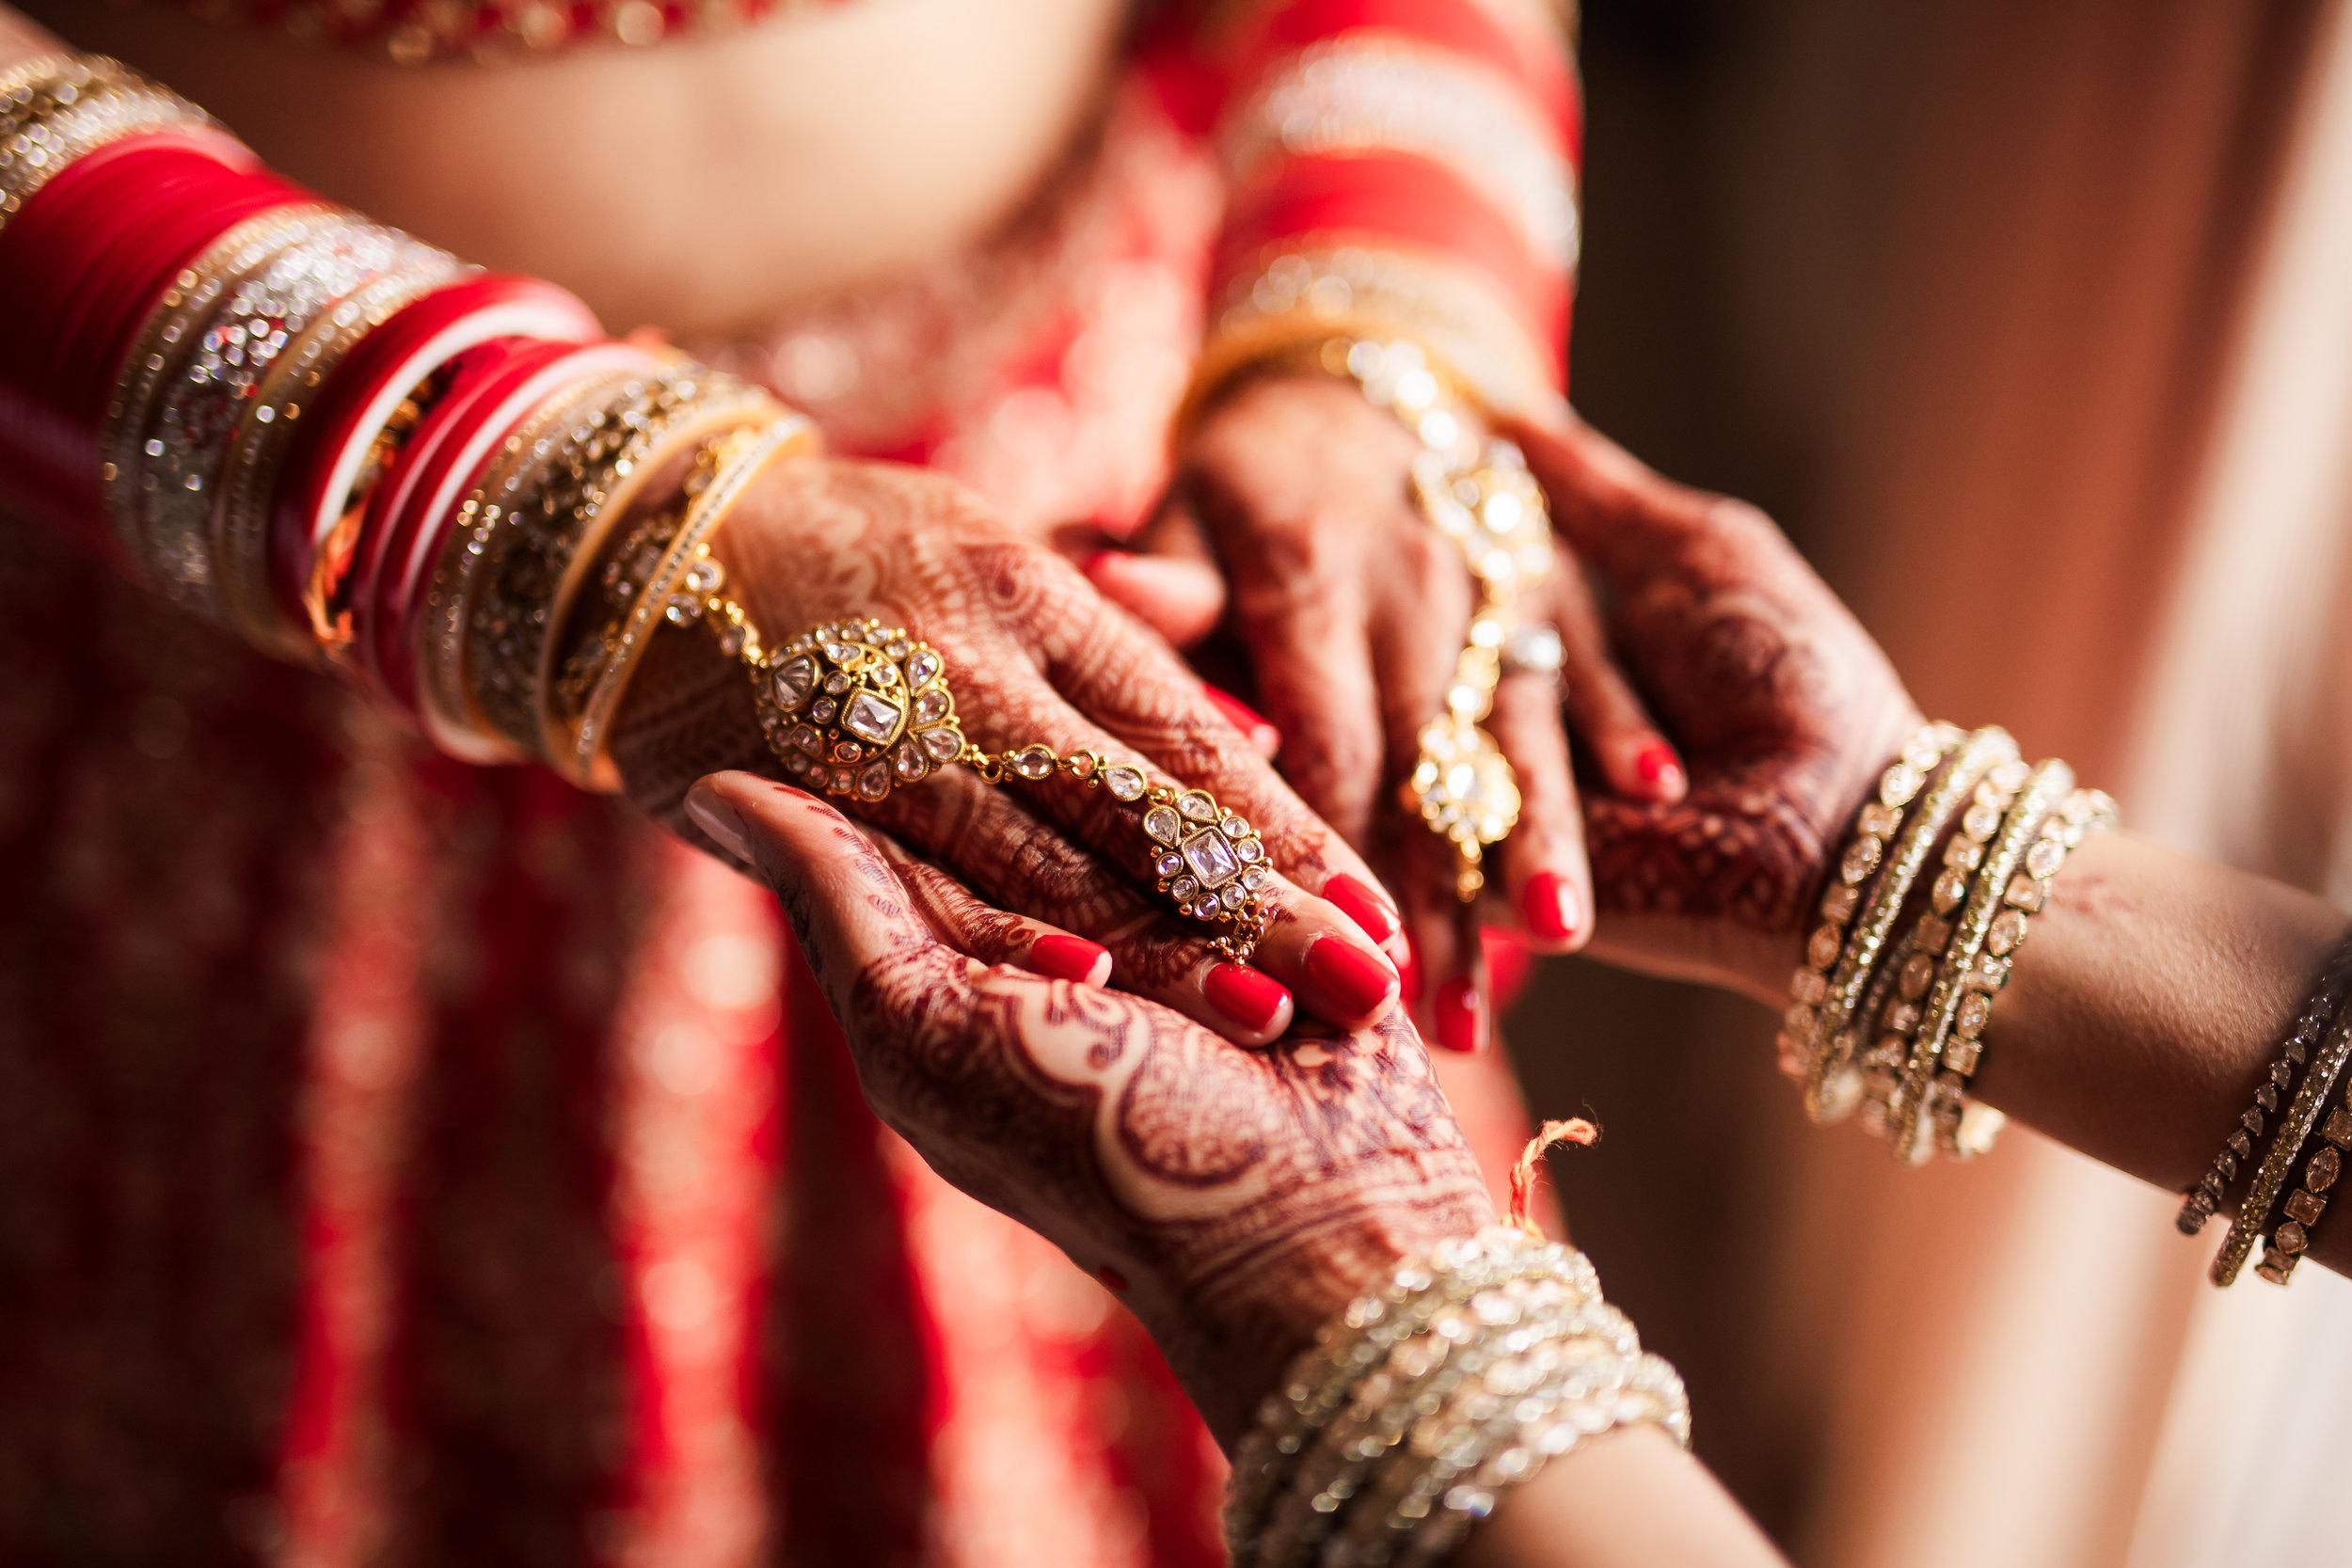 INDIAN WEDDING BRIDE JEWELRY.jpg